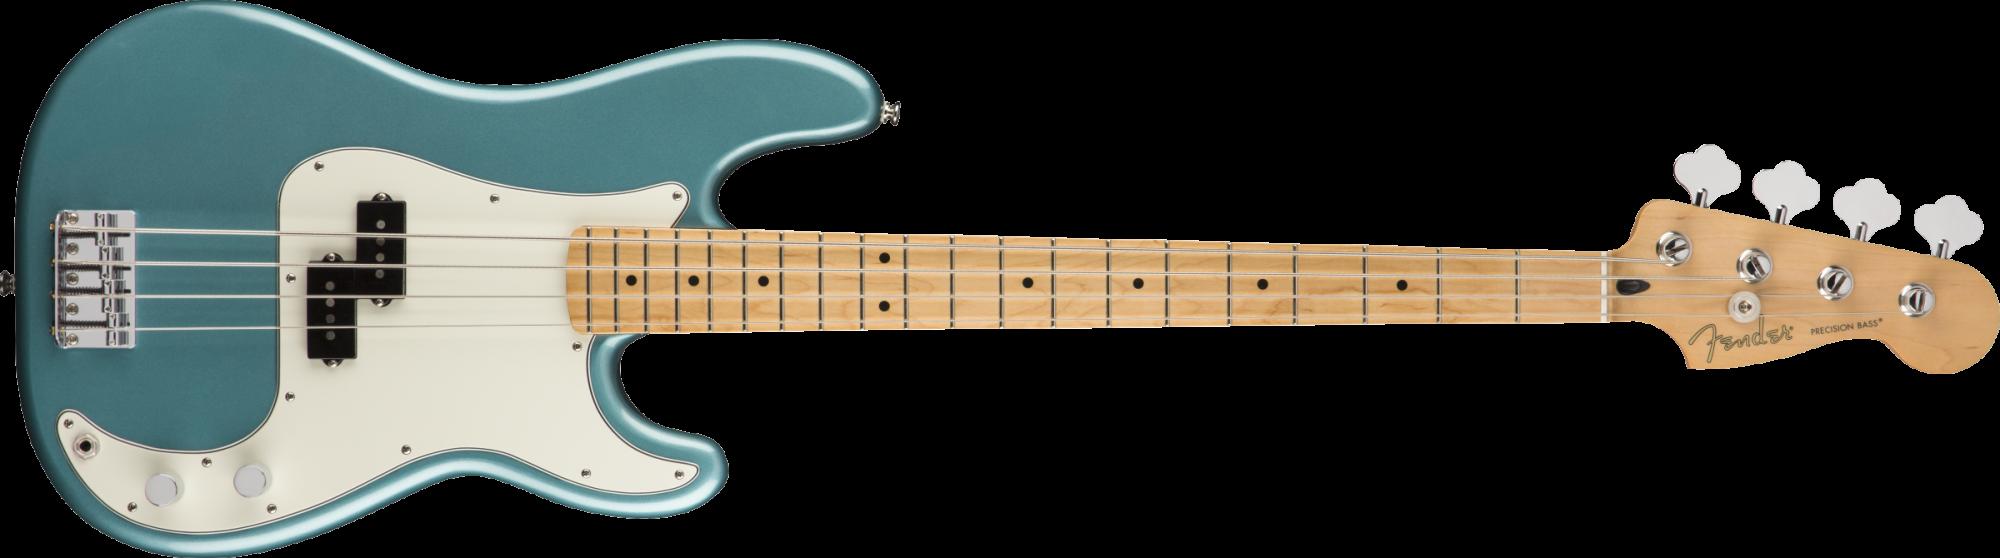 Fender Player Precision Bass®, Maple Fingerboard, Tidepool